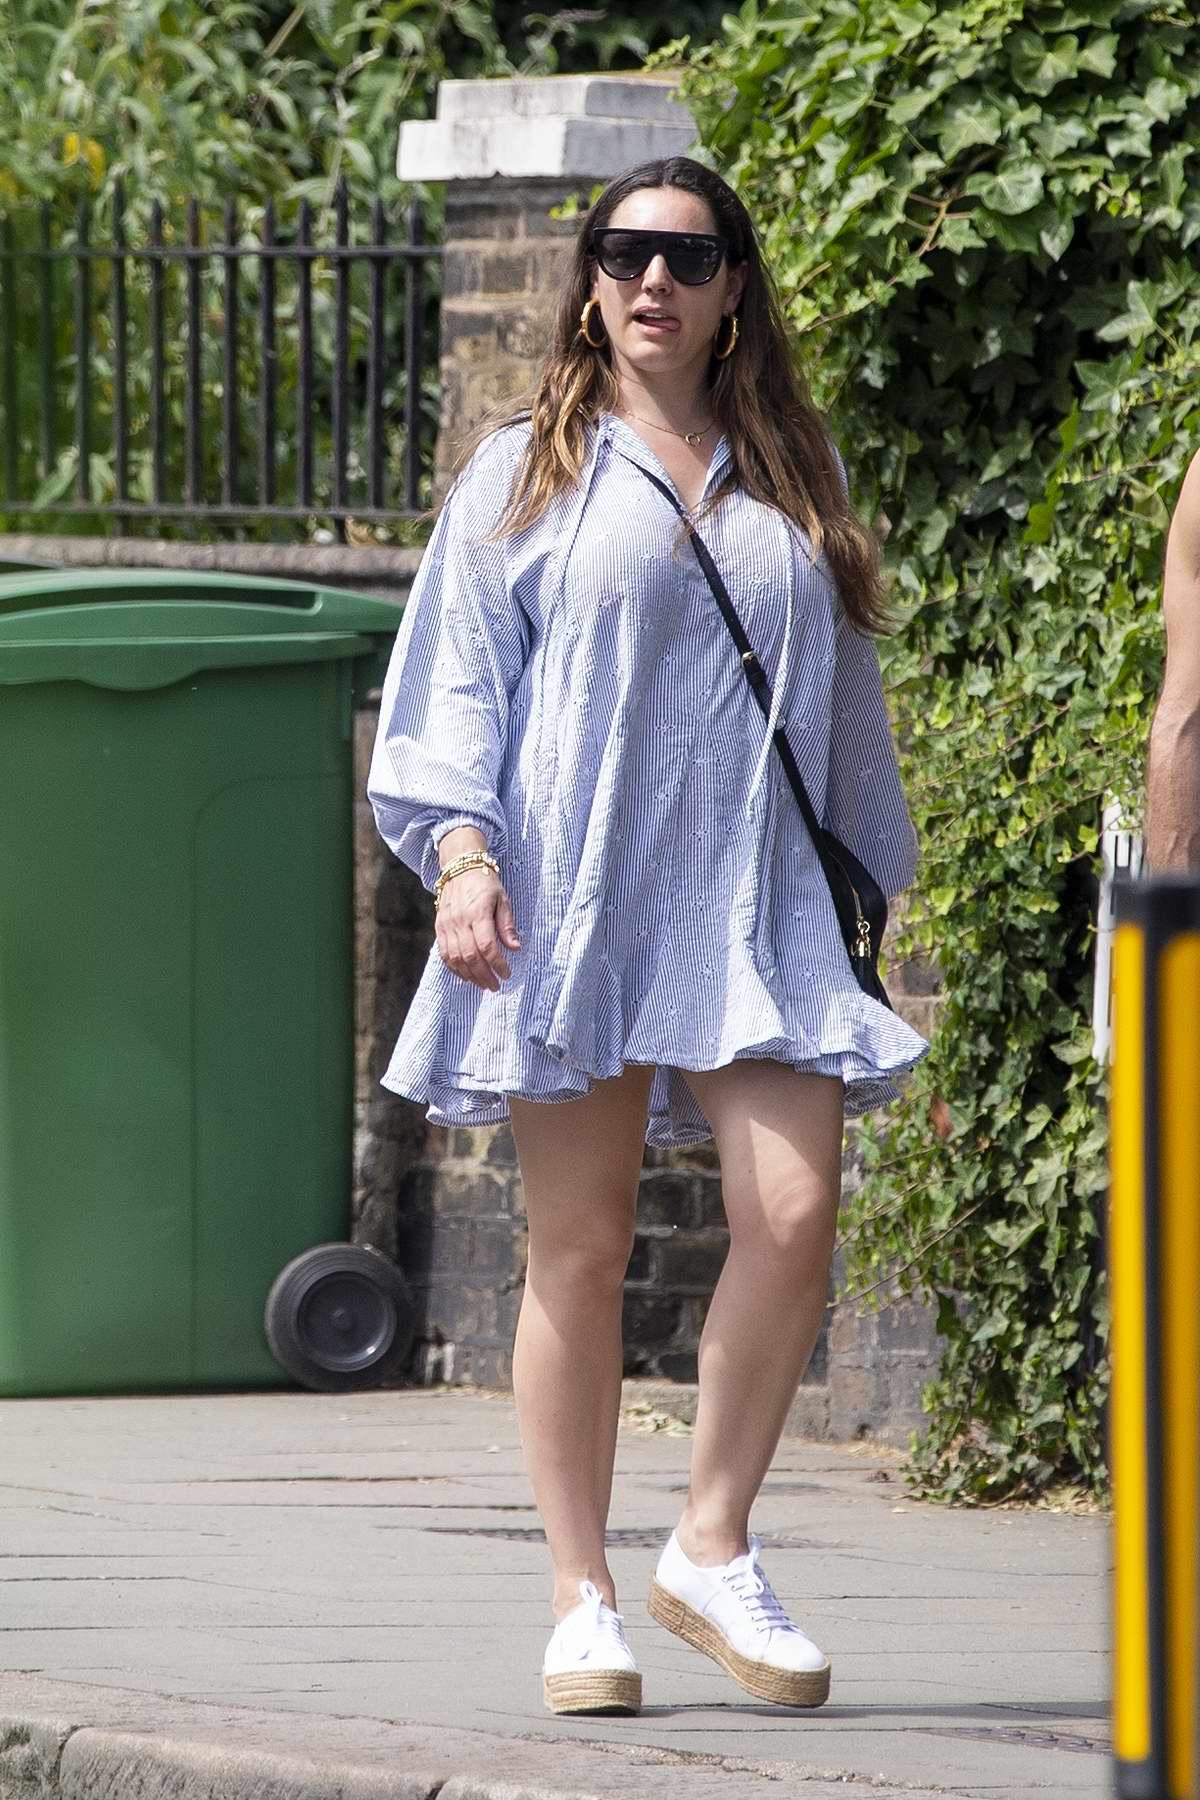 Kelly Brook looks great in a light blue mini dress as she steps out in Belsize Park, London, UK